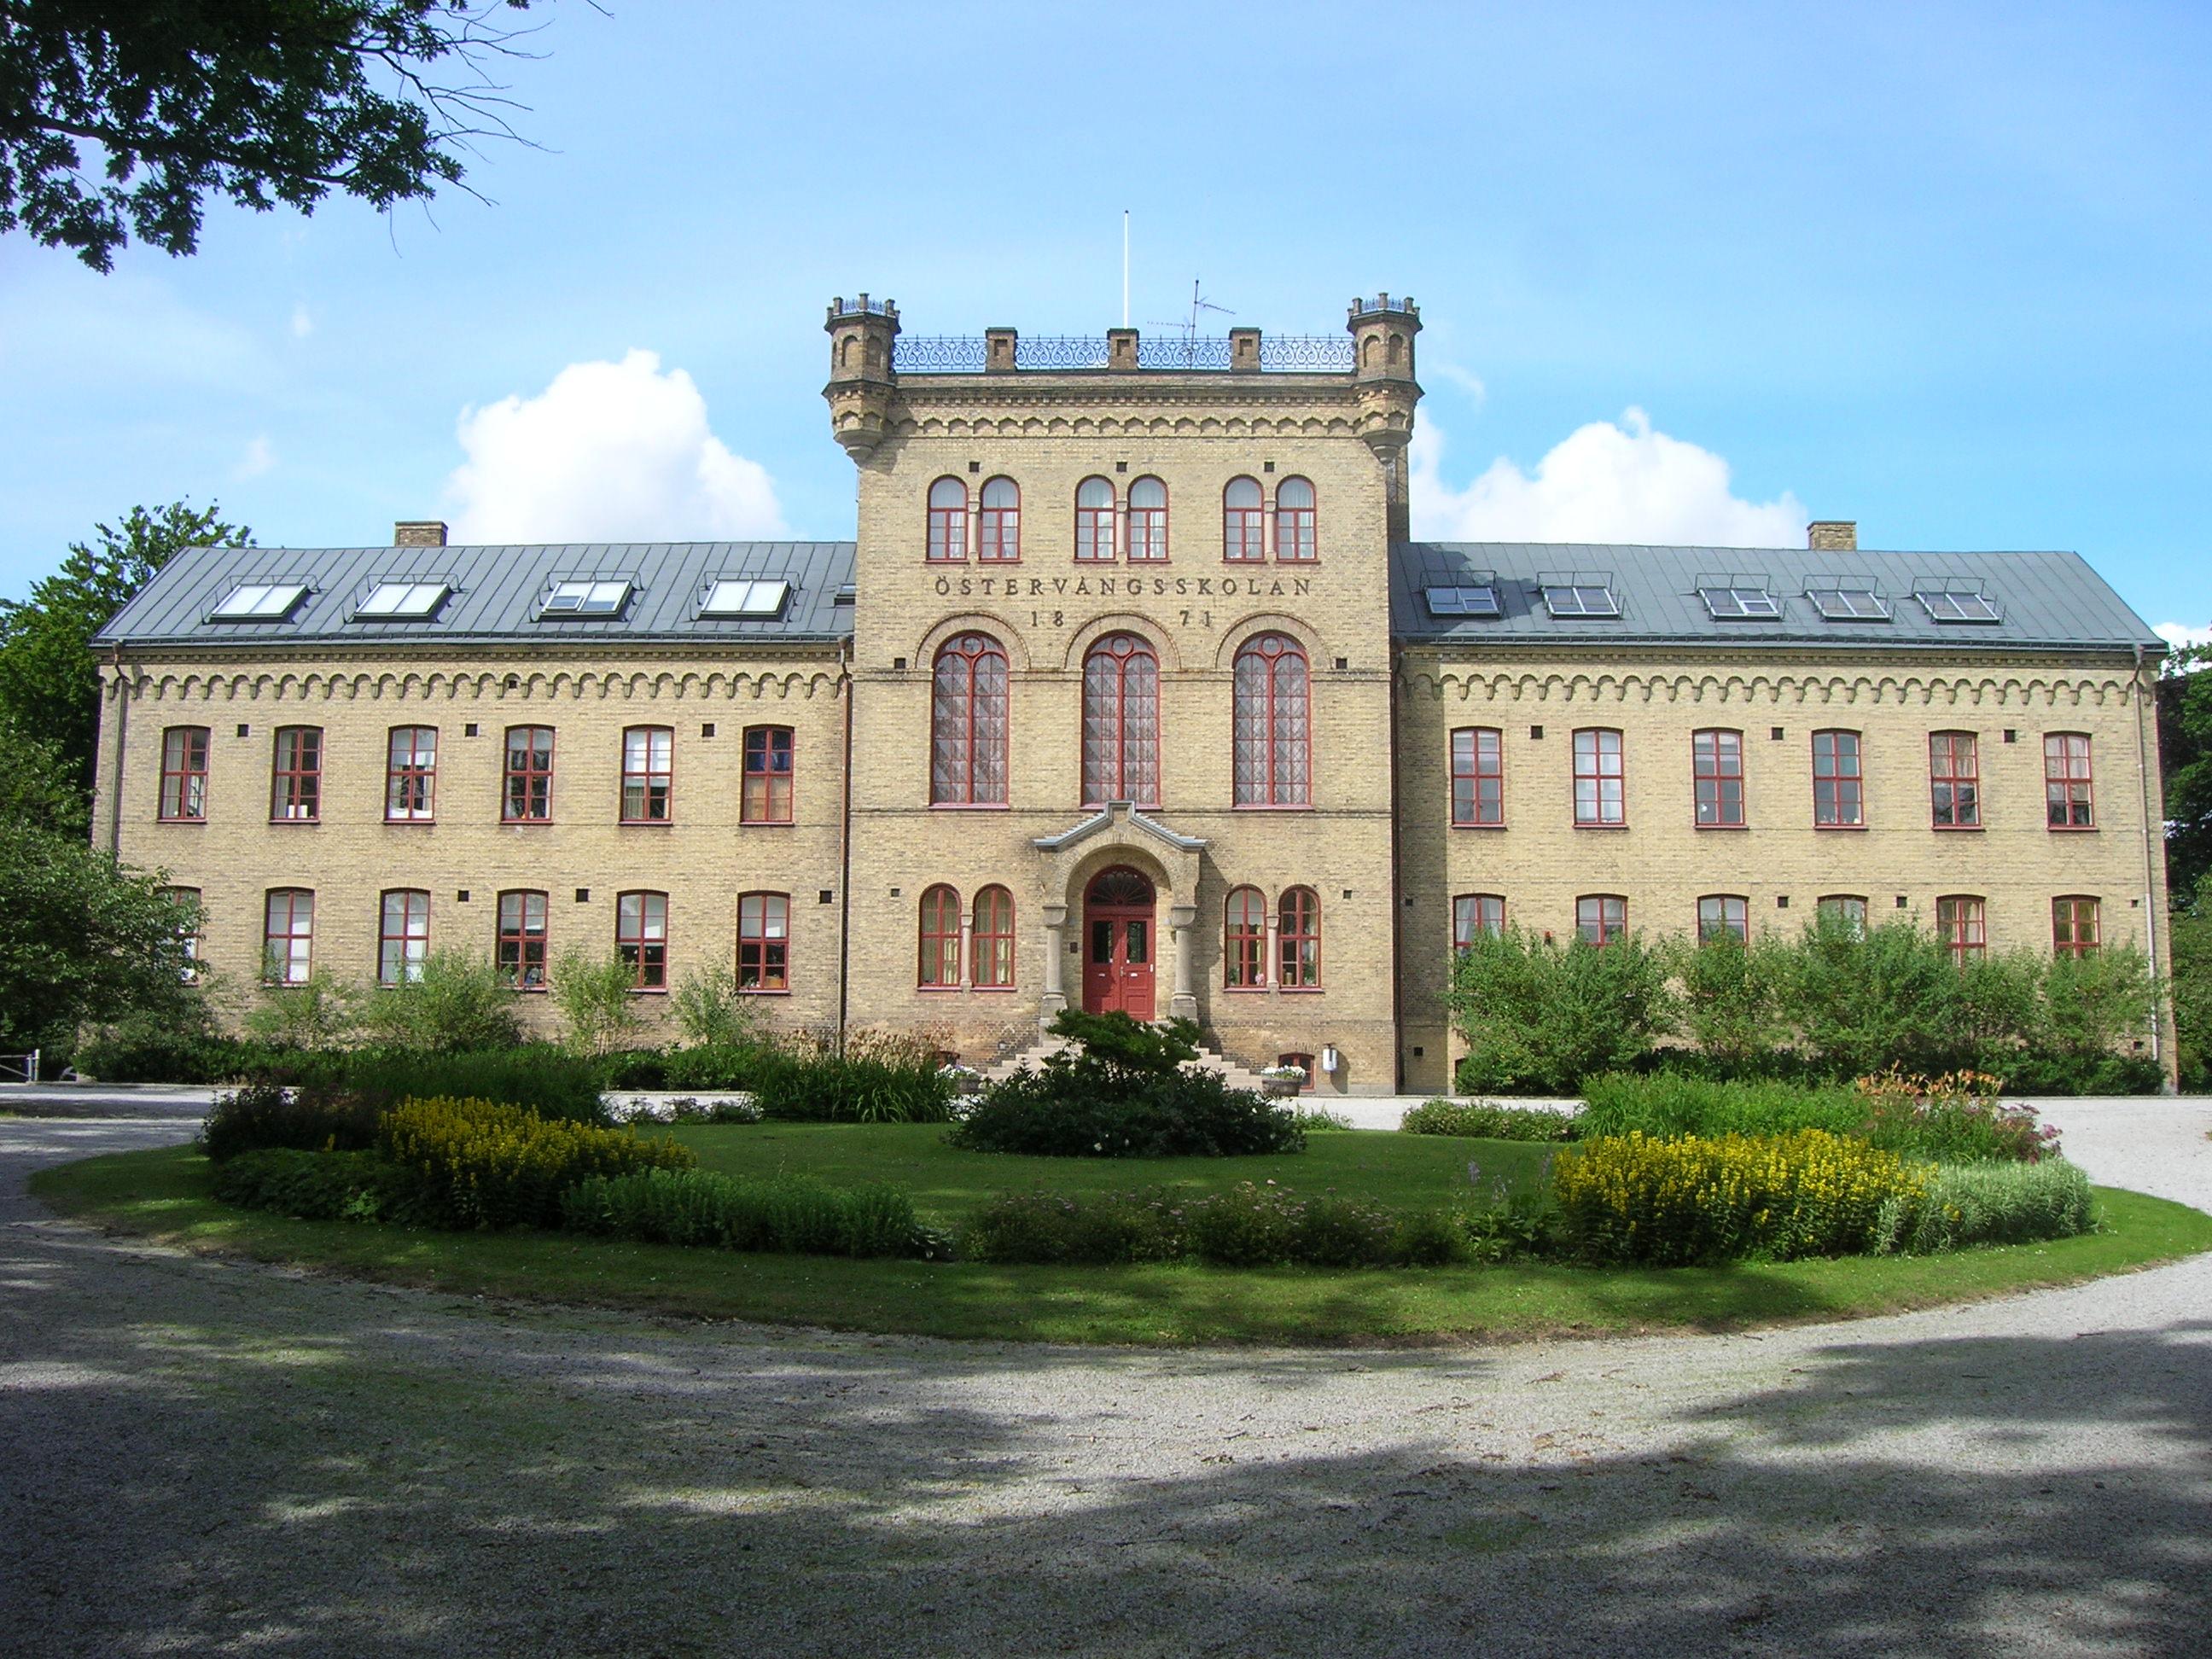 Lund pic